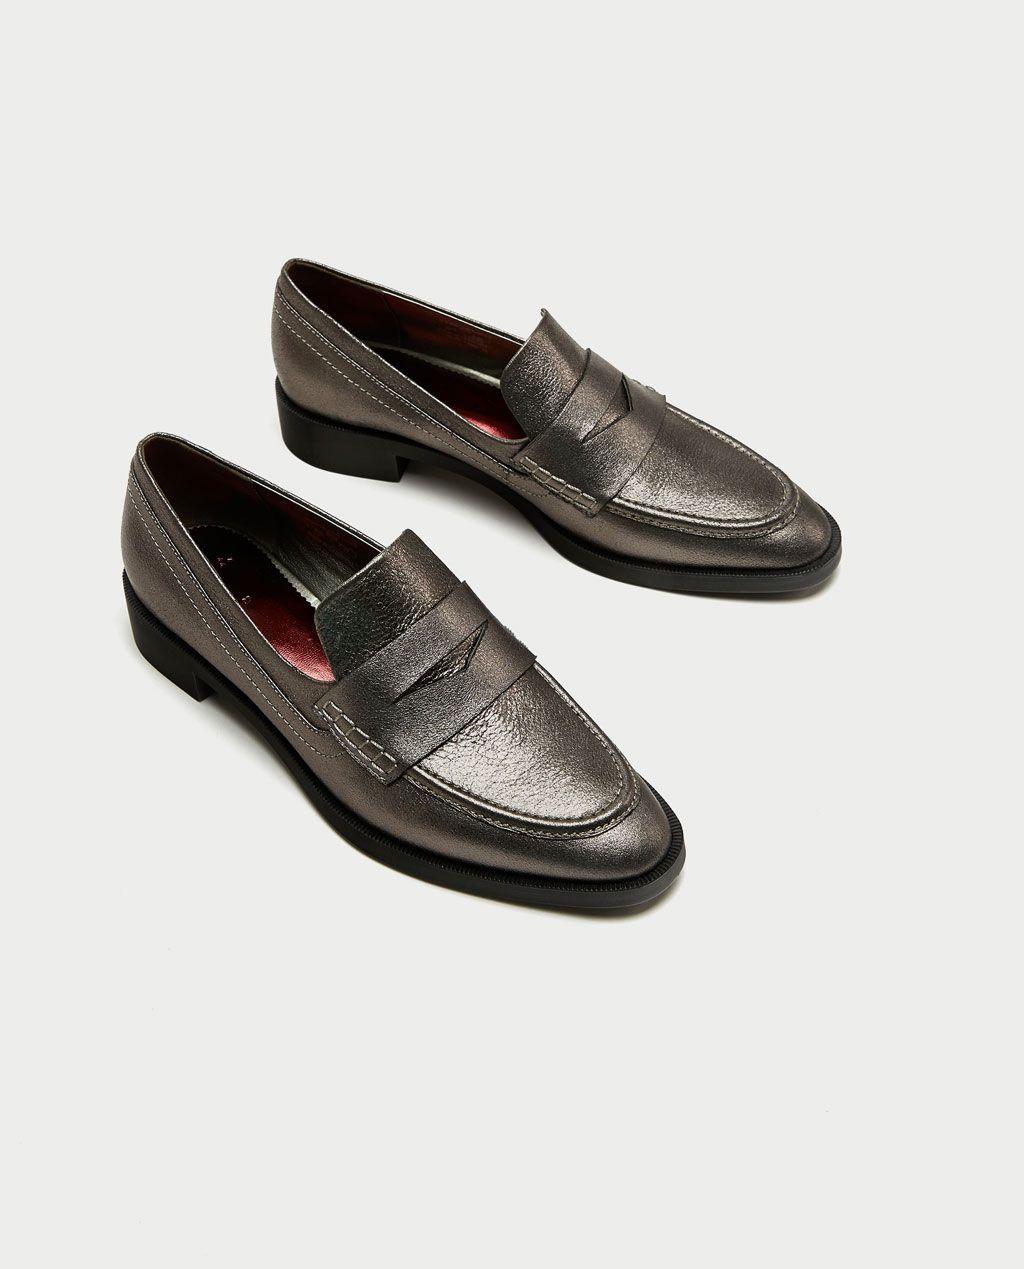 96cc91f99f7 METALLIC LEATHER MOCCASINS-Flat Shoes-SHOES-WOMAN